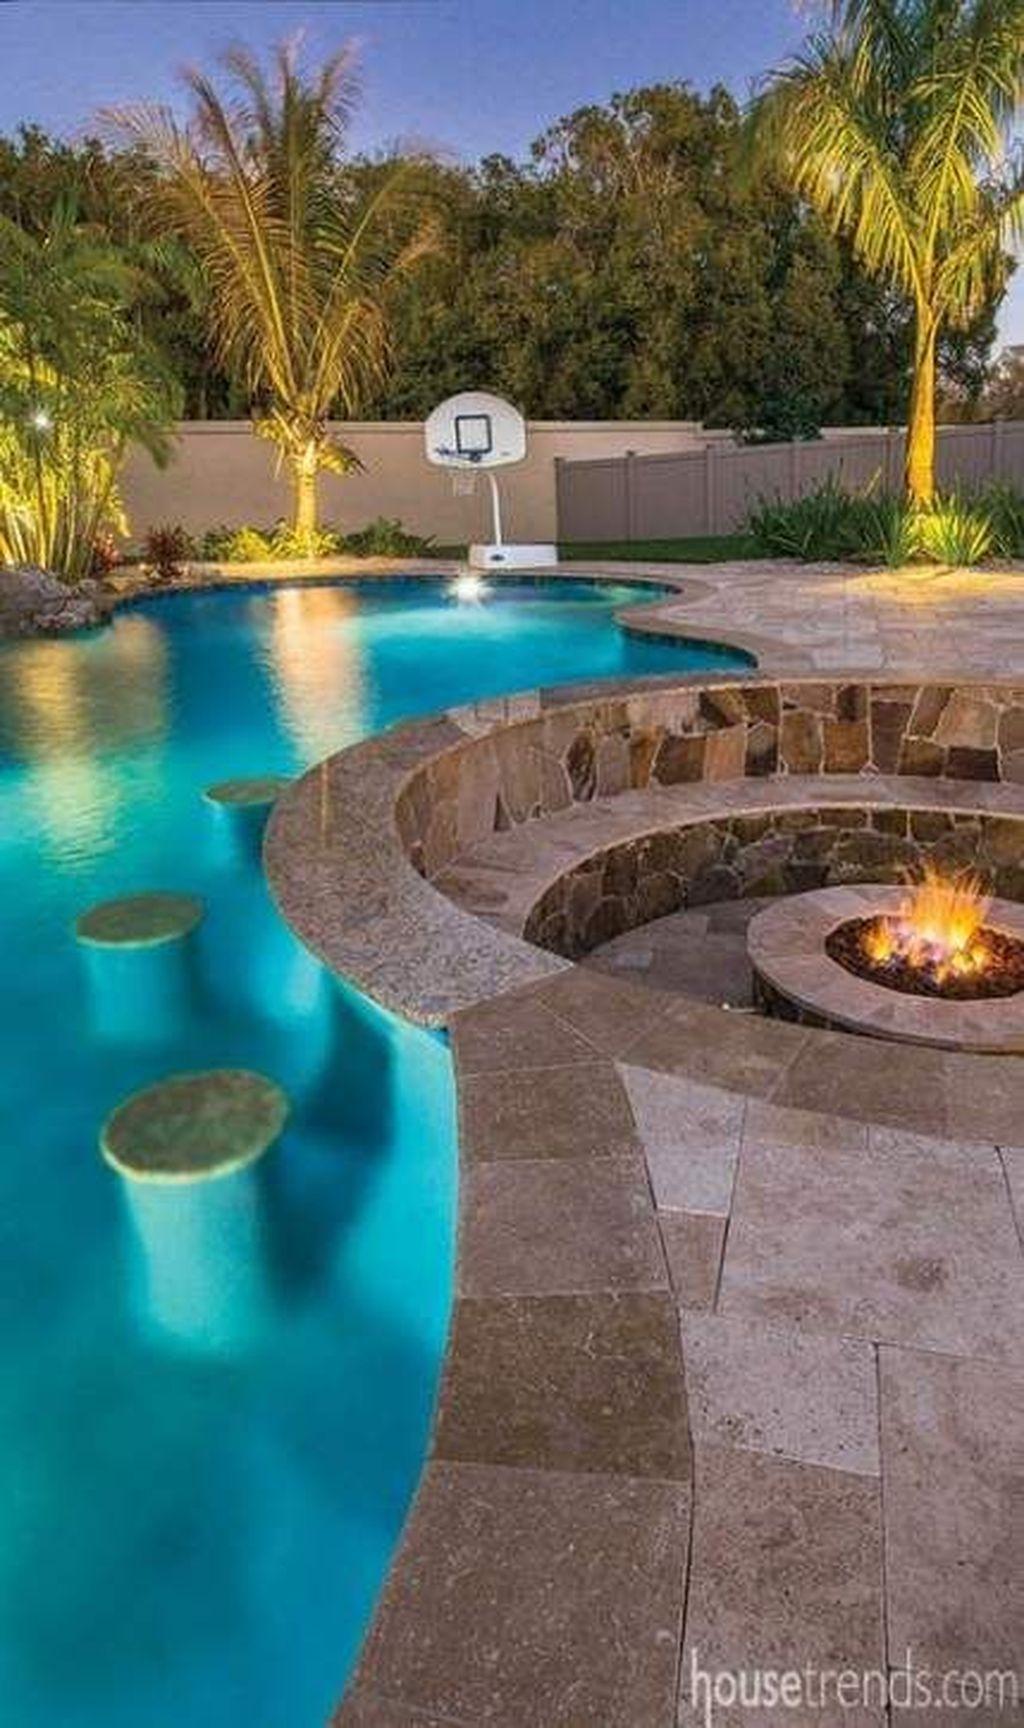 Awesome Backyard Patio Ideas With Beautiful Pool 21